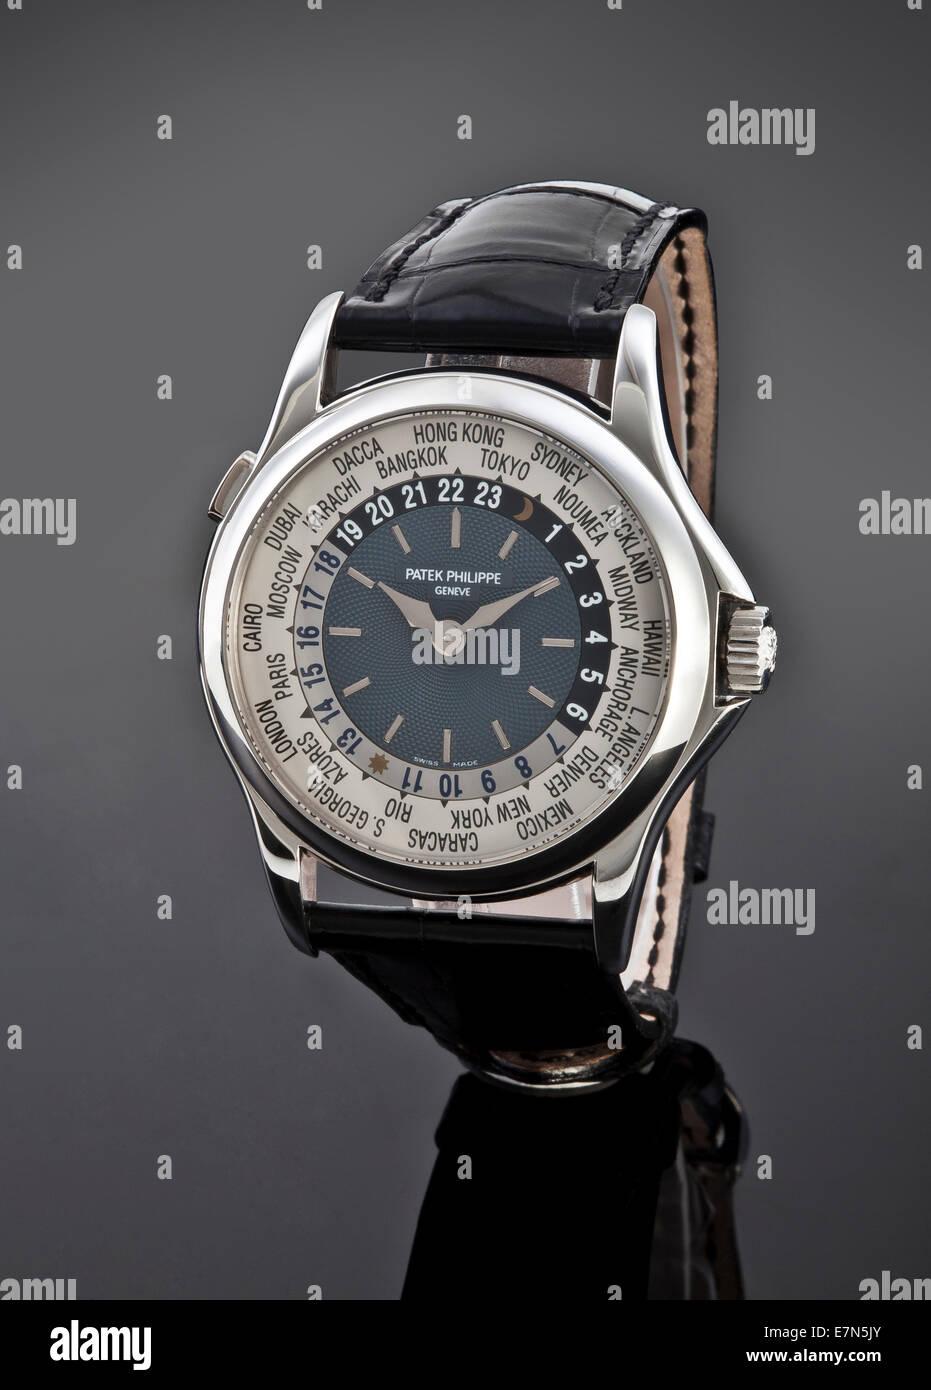 Patek Philippe Metallic Wrist Watch with Leather Strap - Stock Image